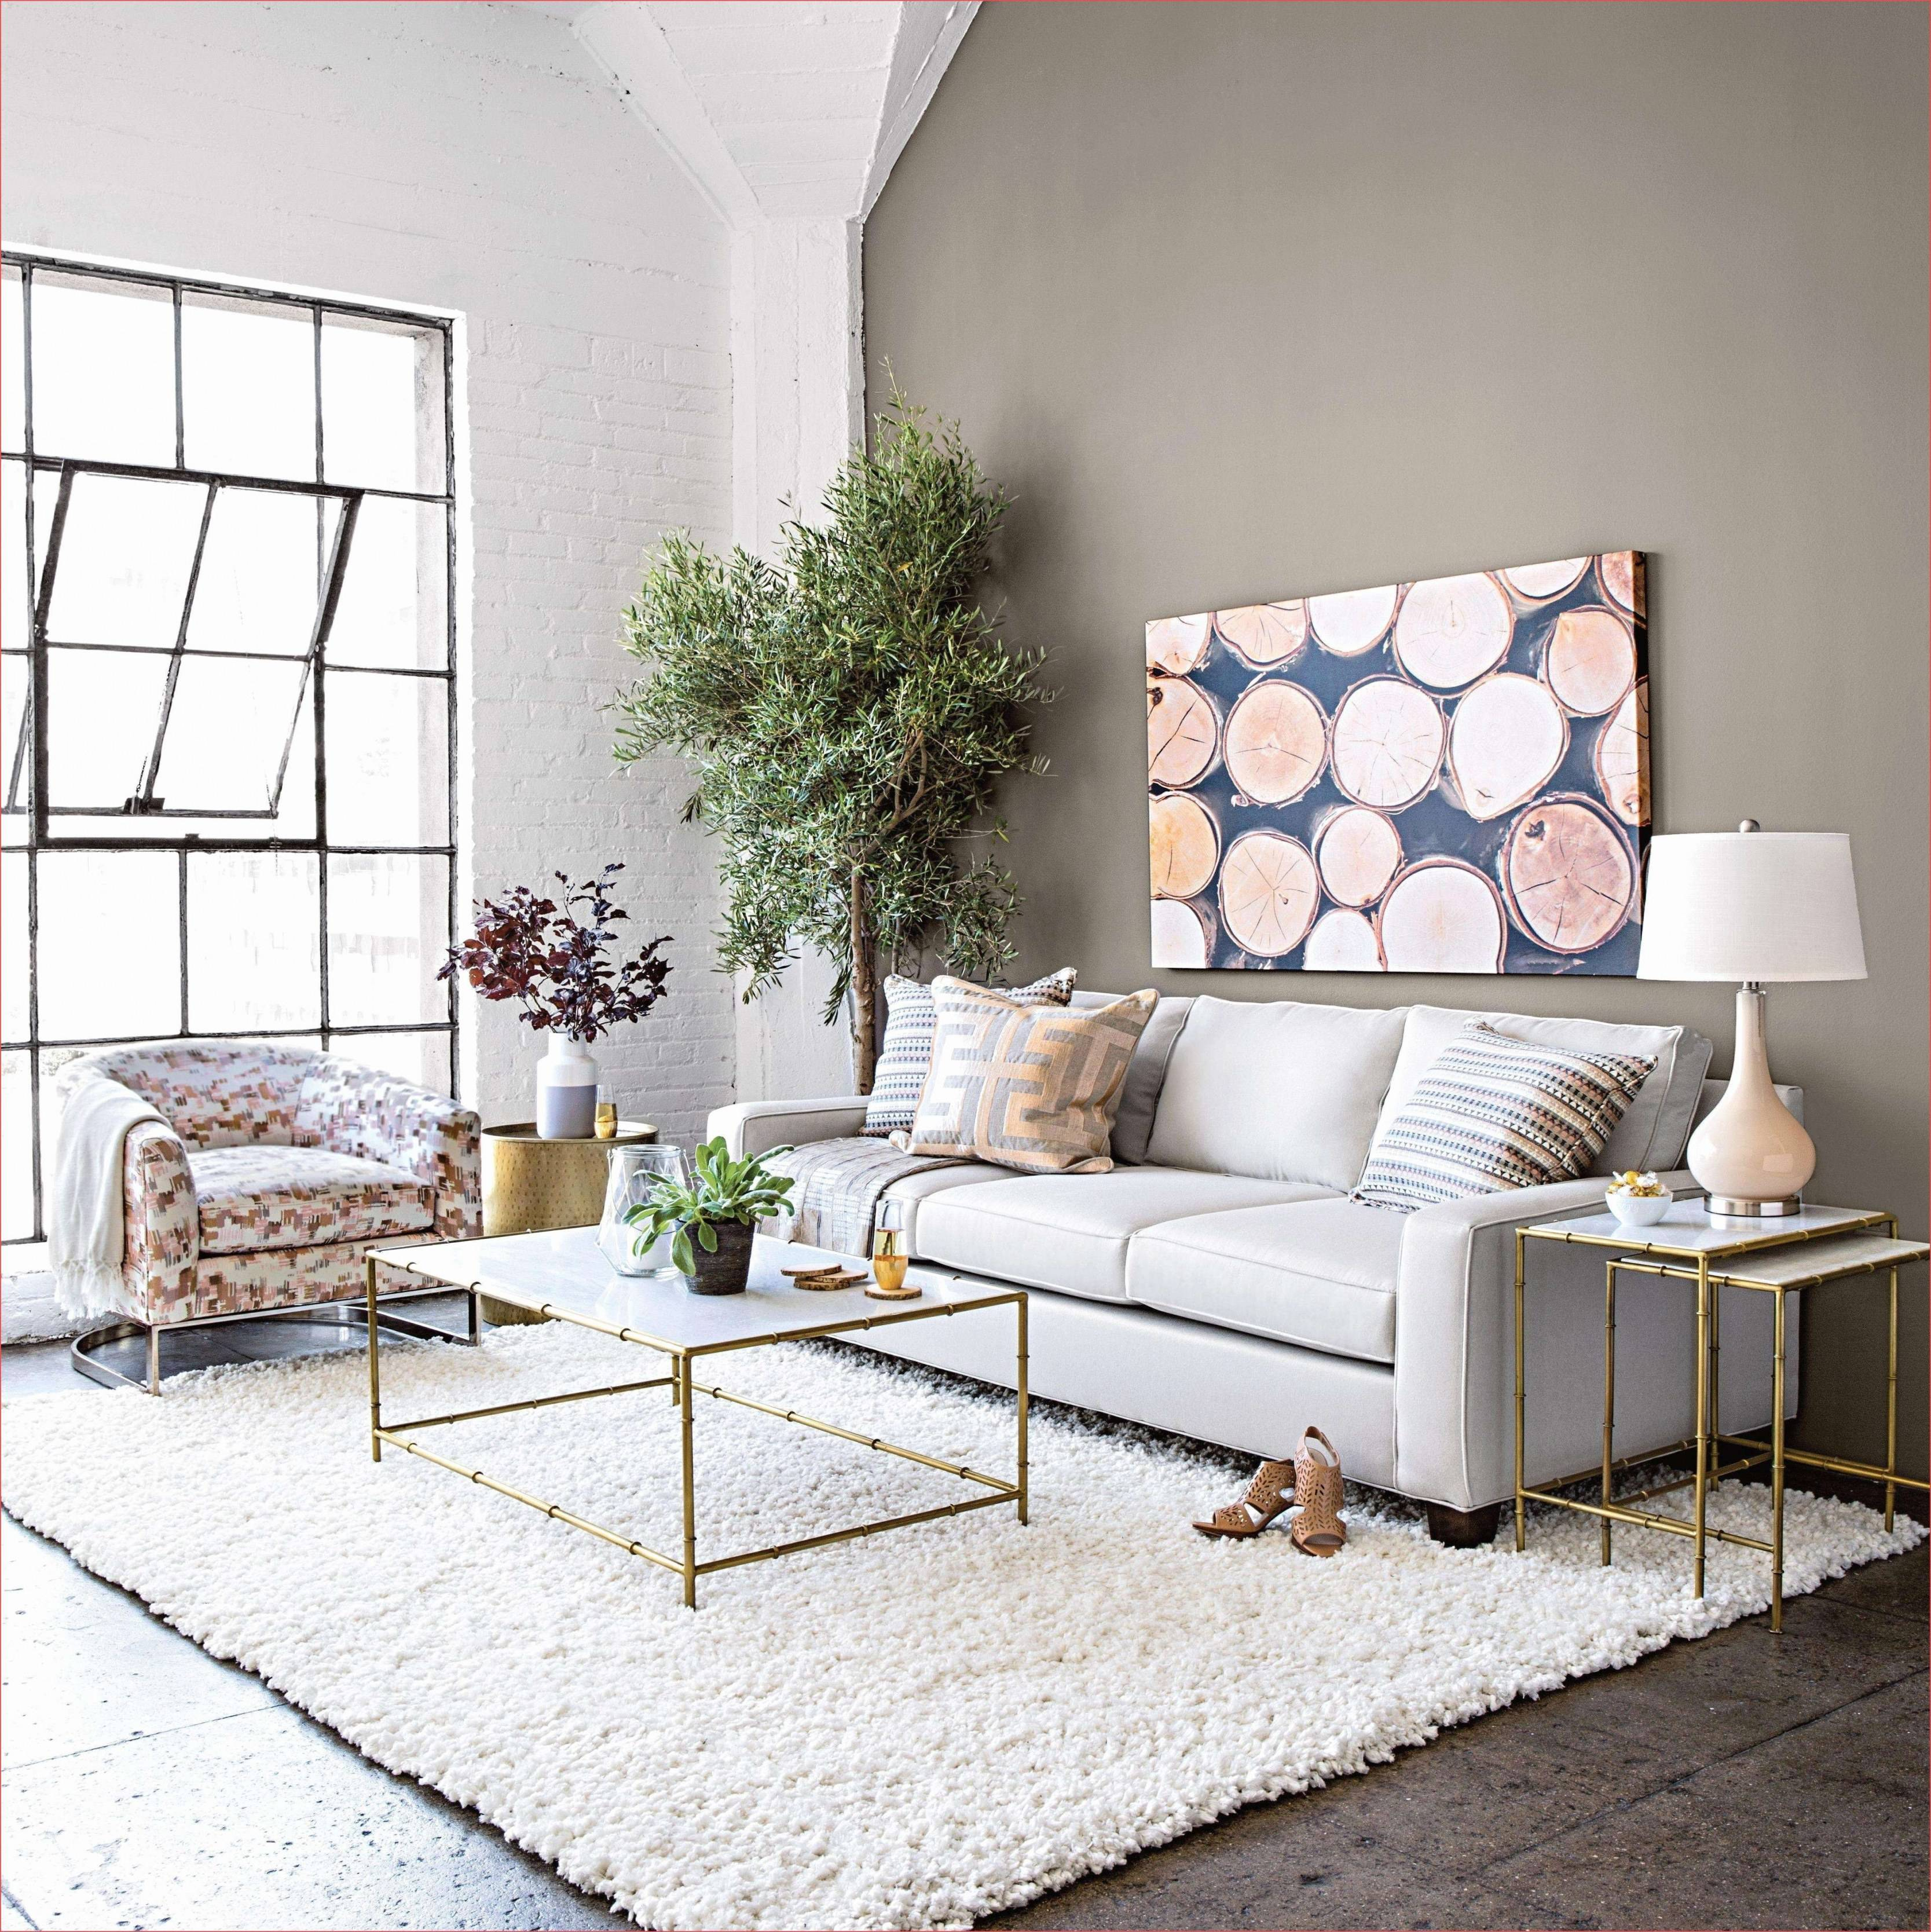 minimalist bedroom decor new 25 minimalist dining room chairs design of minimalist bedroom decor